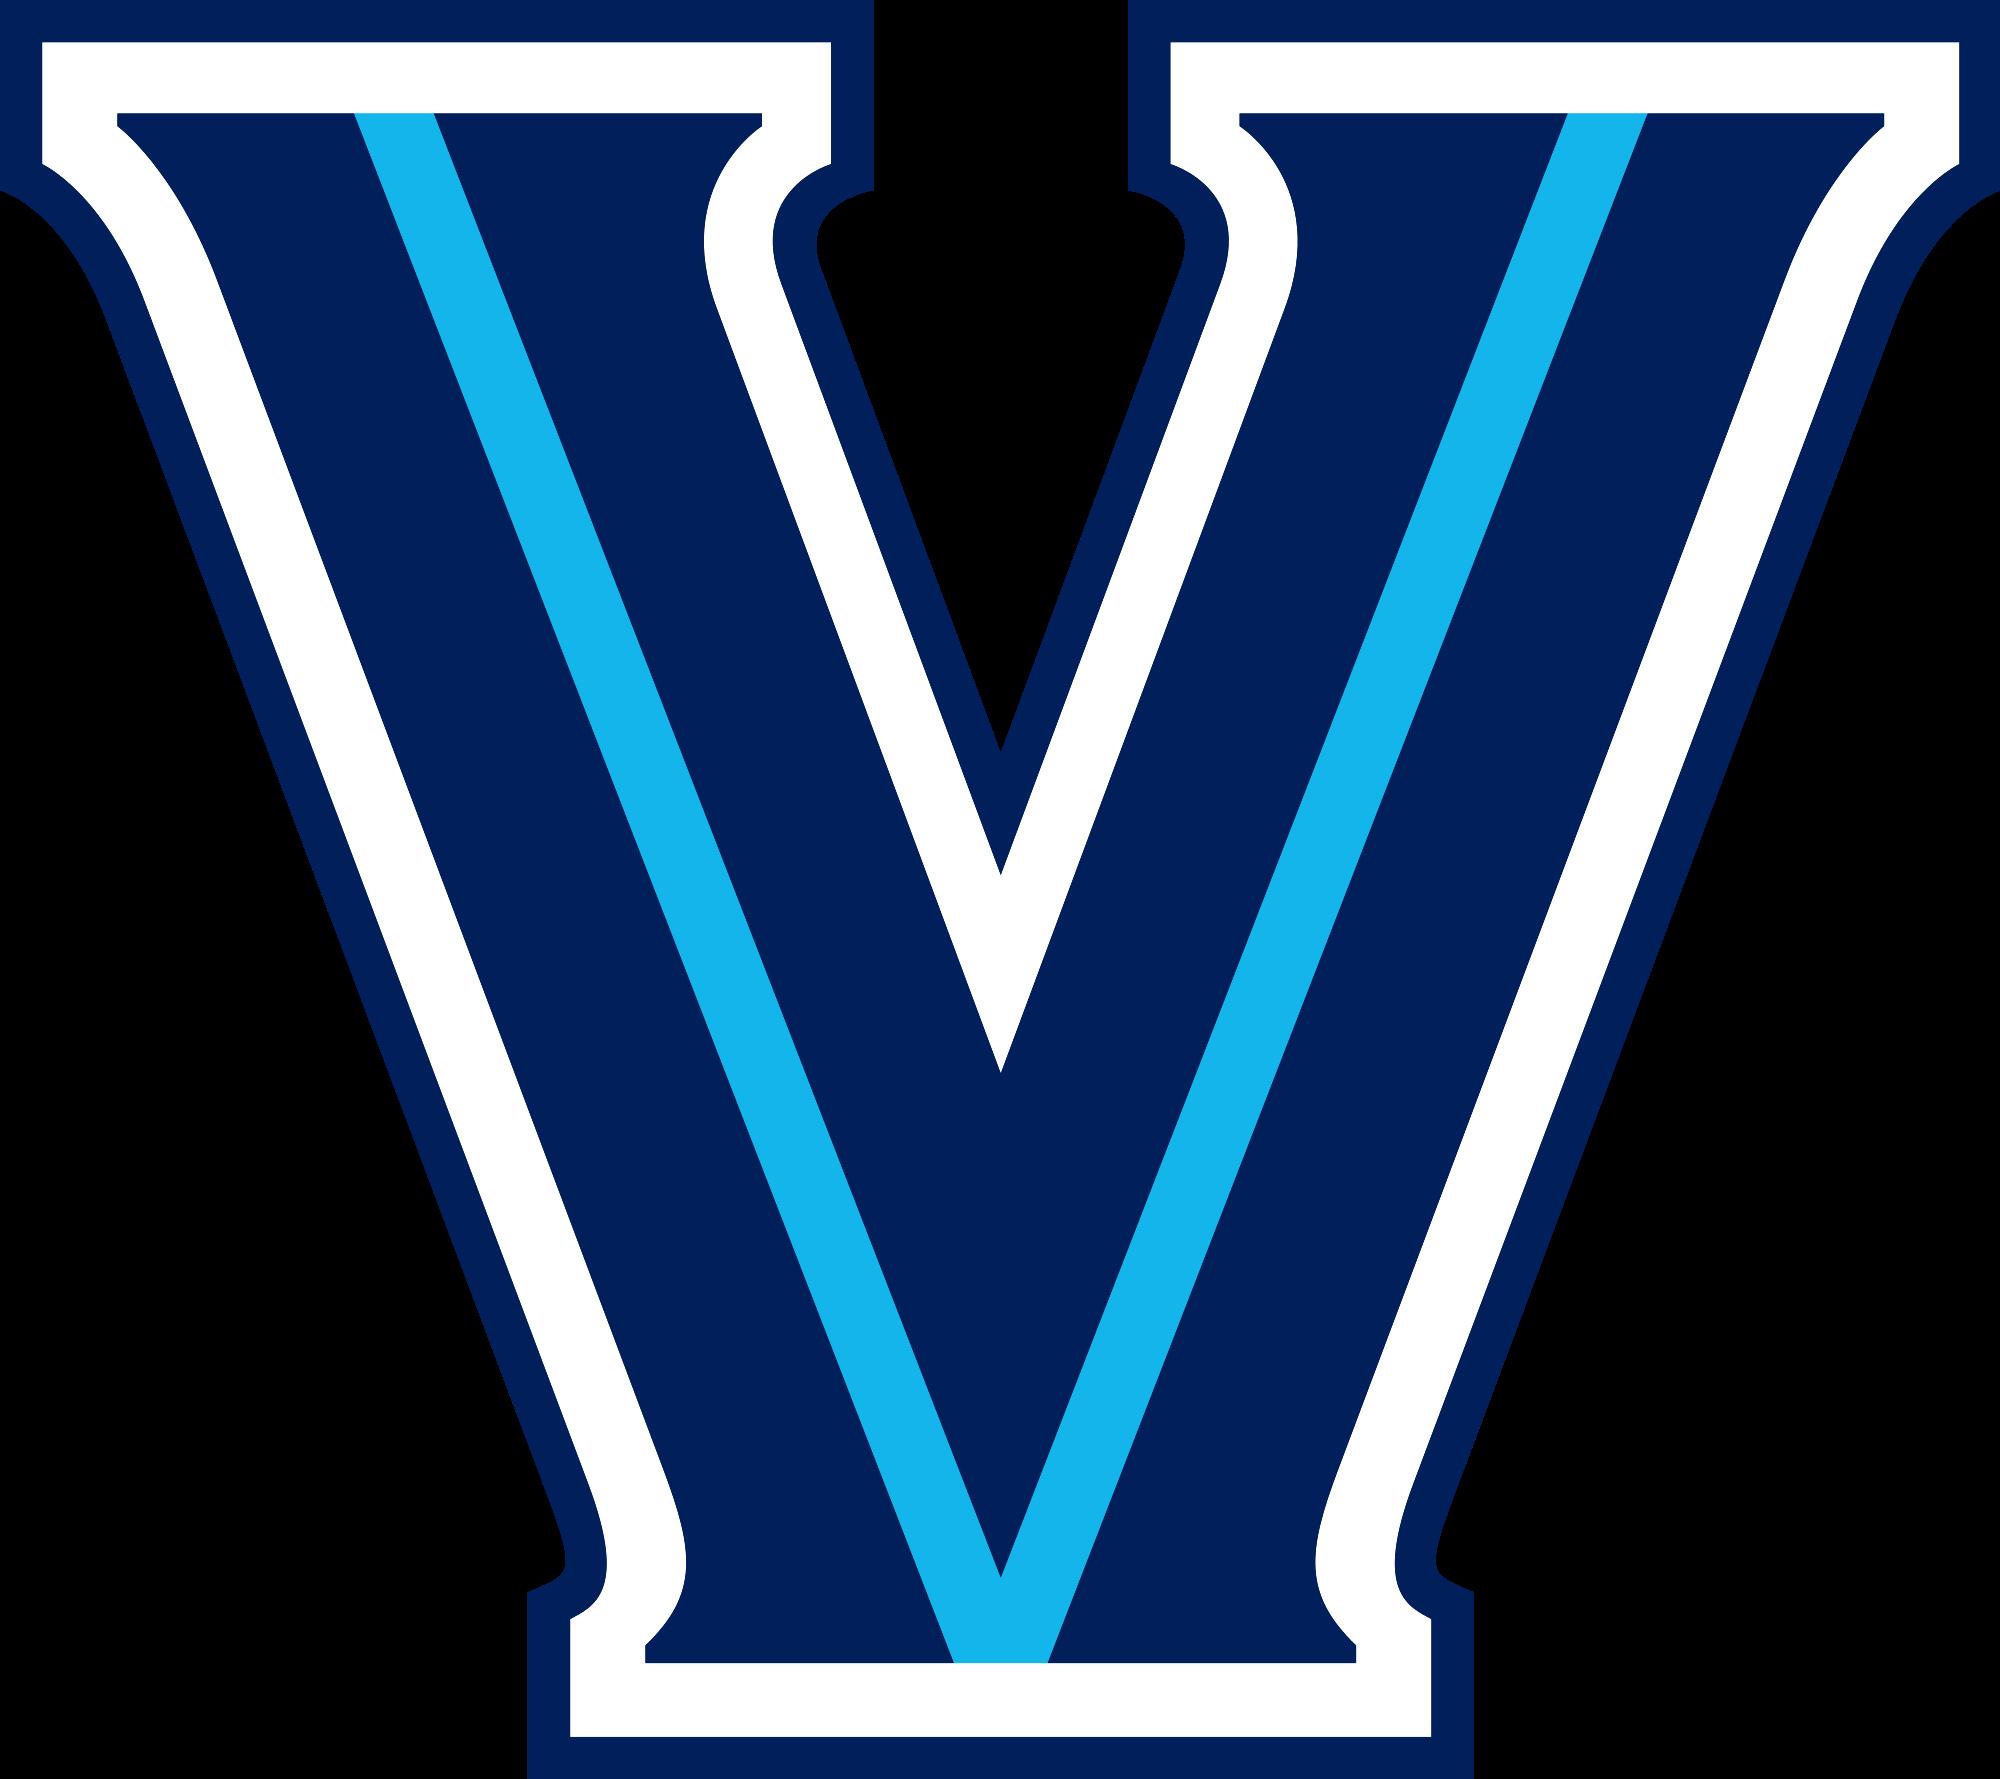 Basket Ball Ncaa Team Villanova Villanova Wildcats Villanova Wildcats Logo